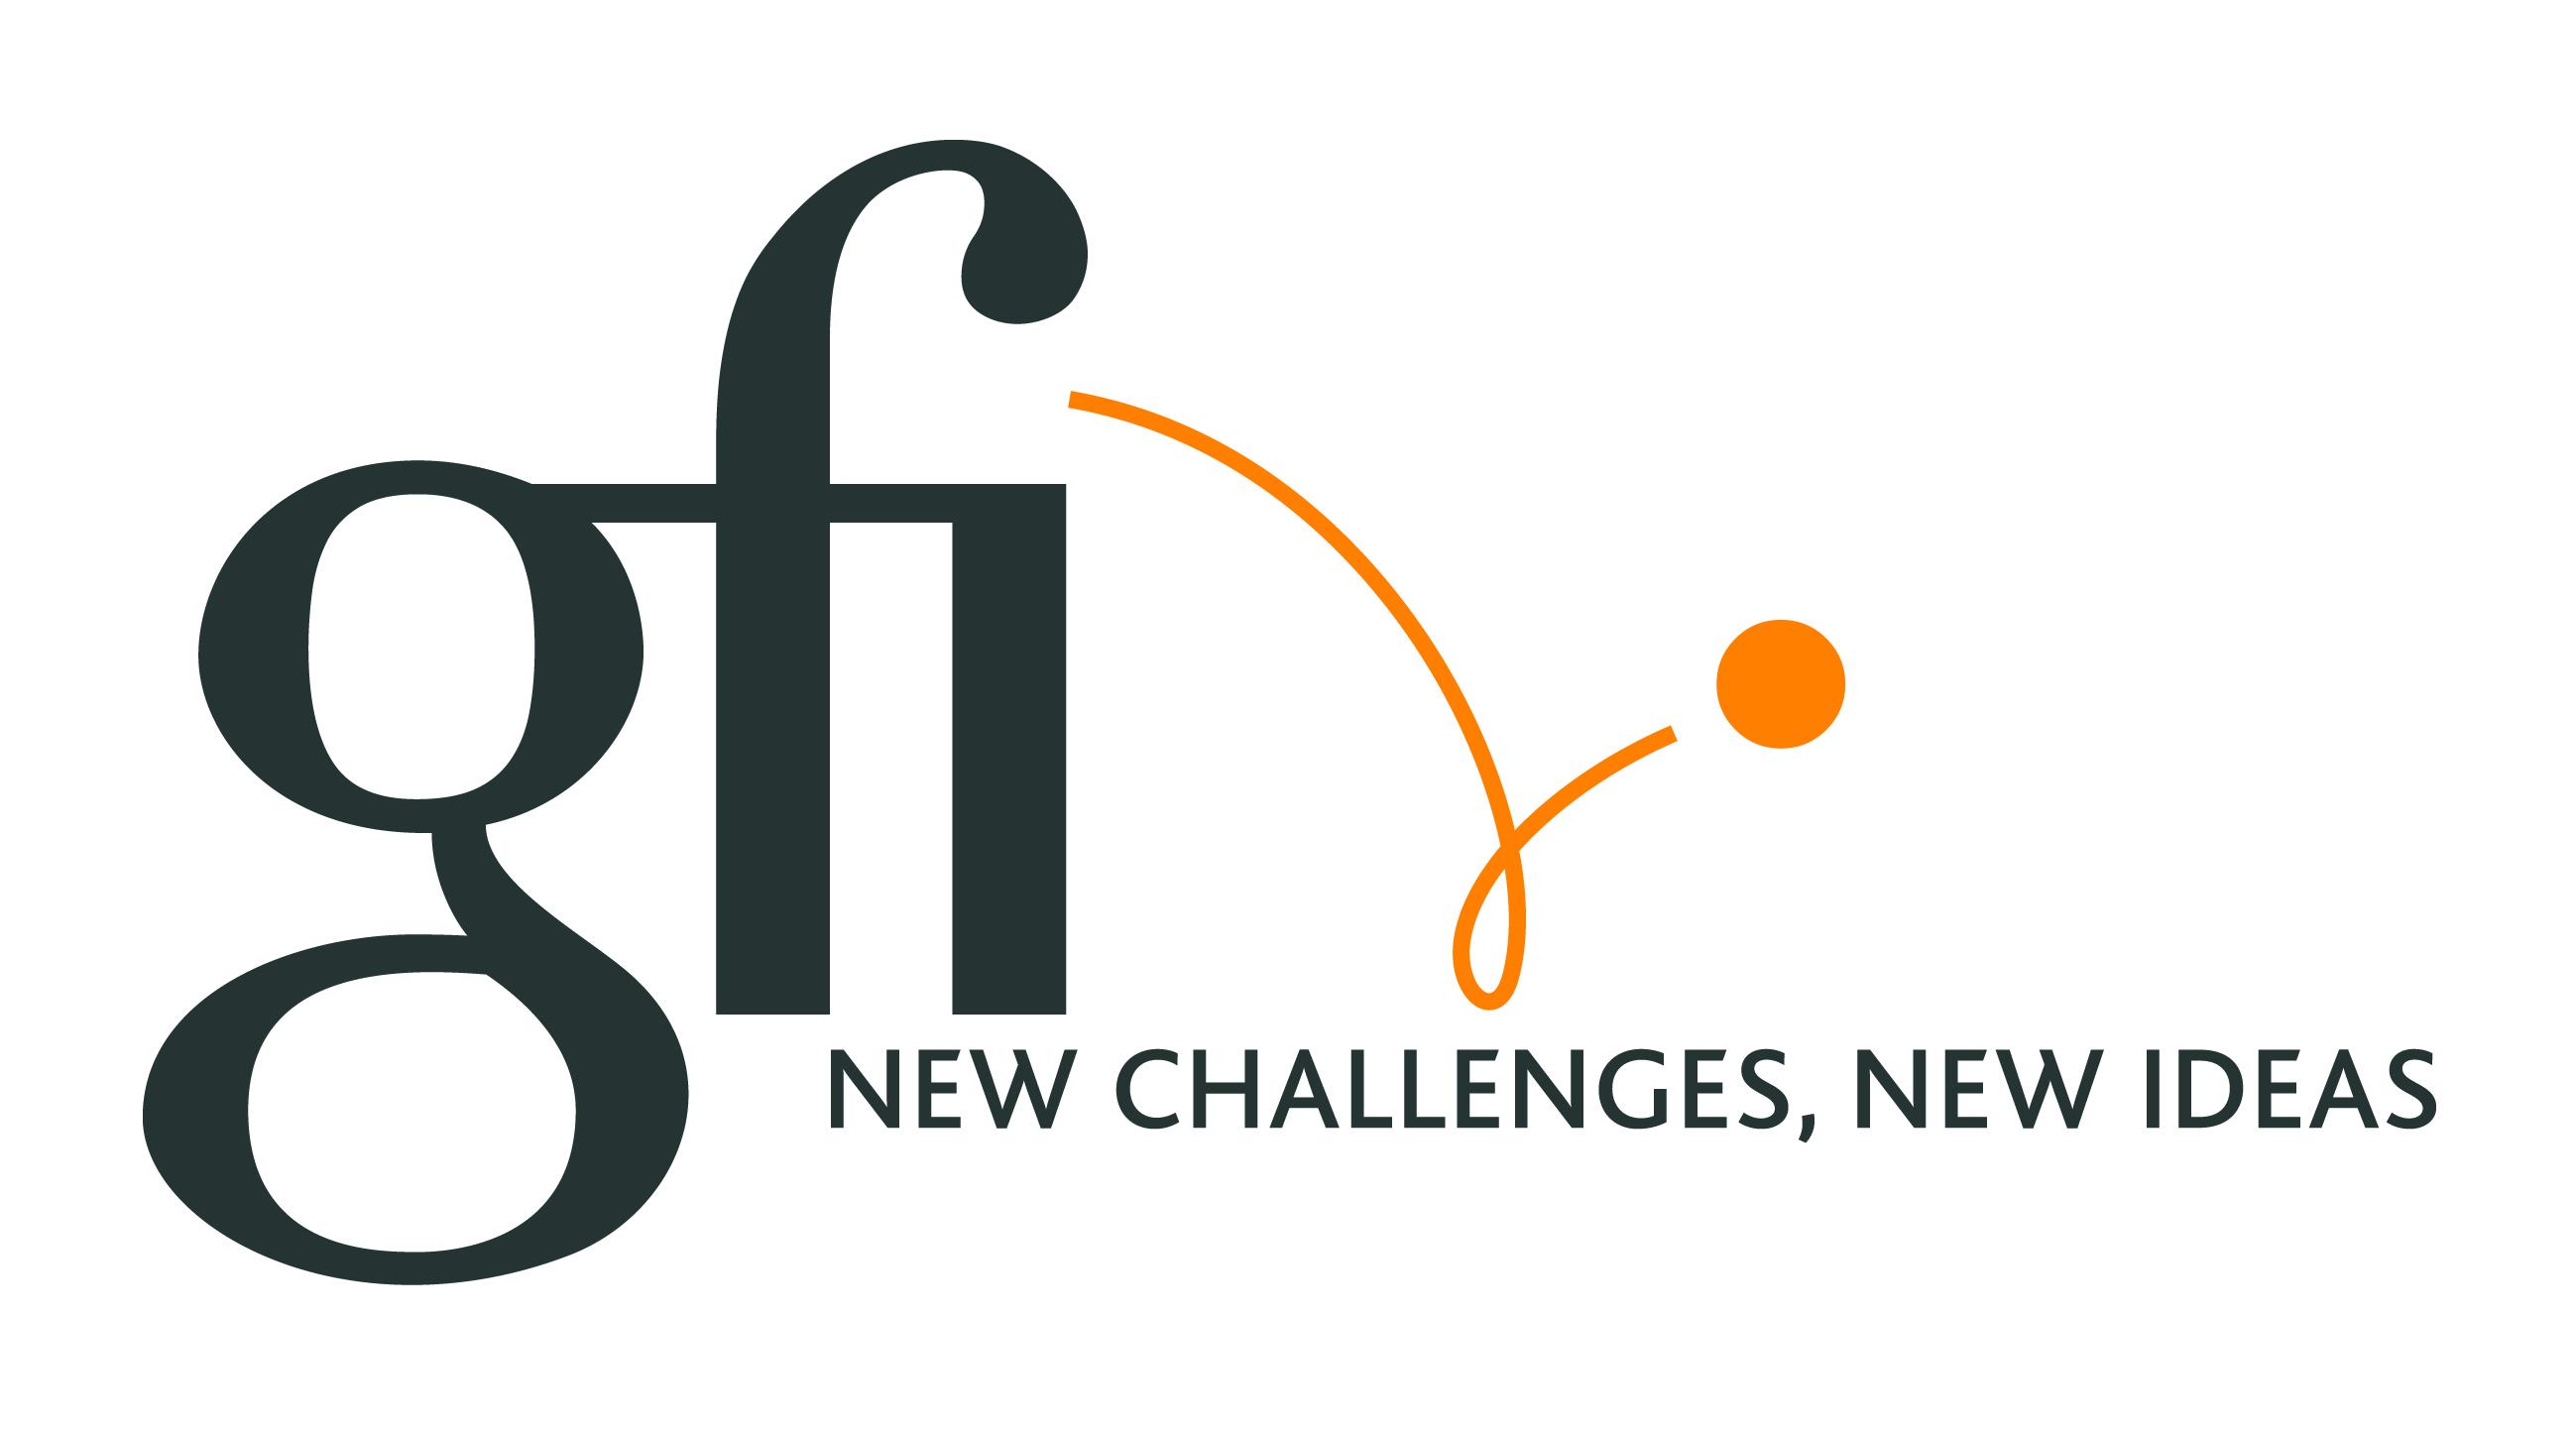 Gfi_logo_cmjn_300dpi_1ligne-copie